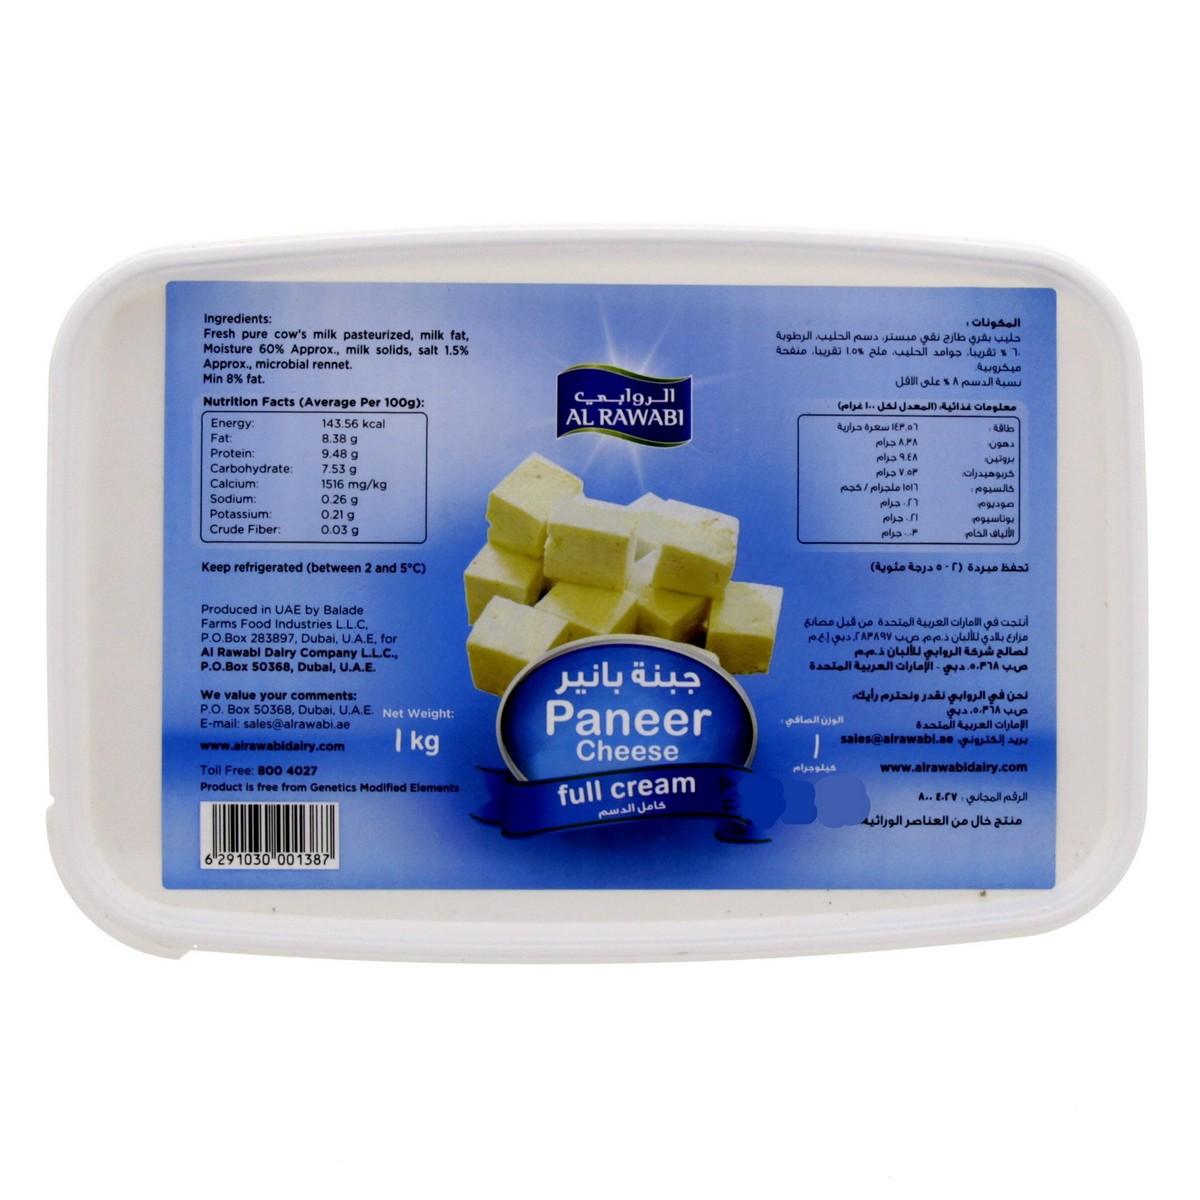 Buy Al Rawabi Paneer Cheese Full Cream 1kg - Soft Cheese